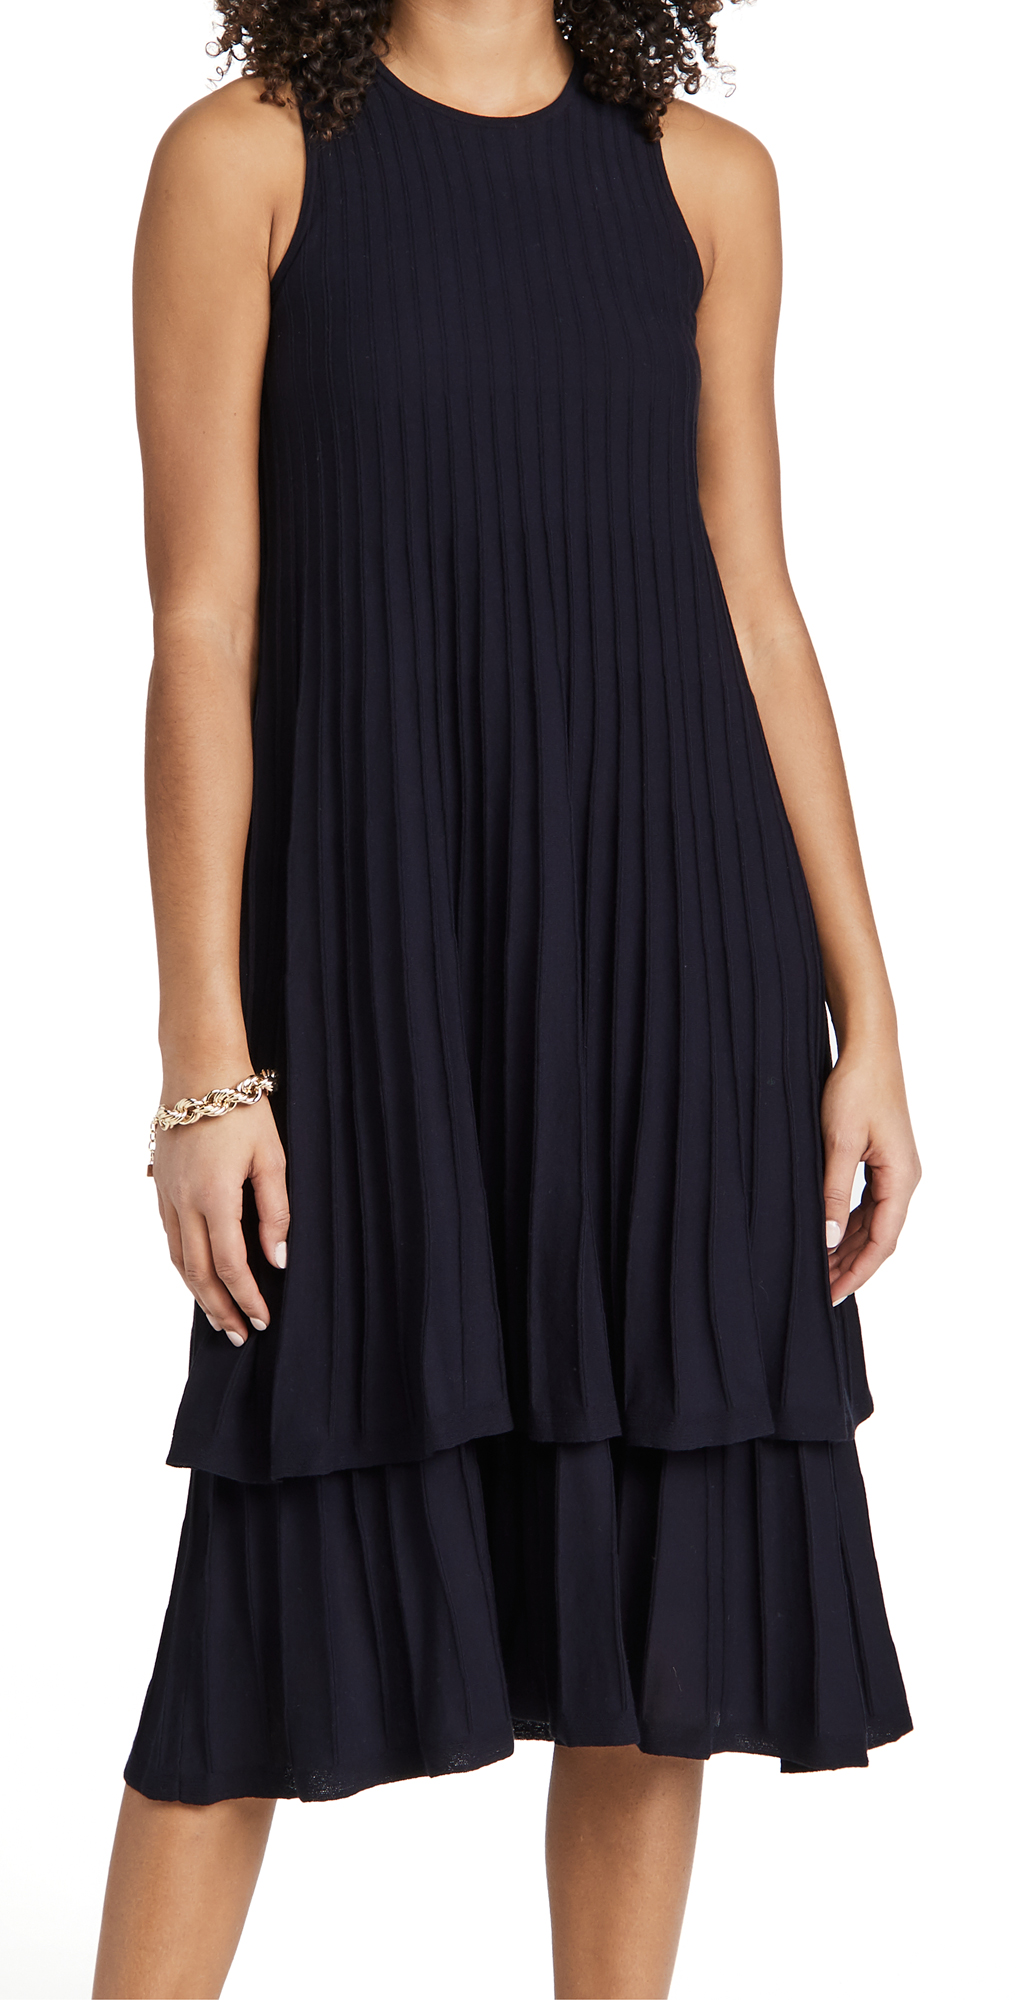 TSE Cashmere Cotton Swing Dress